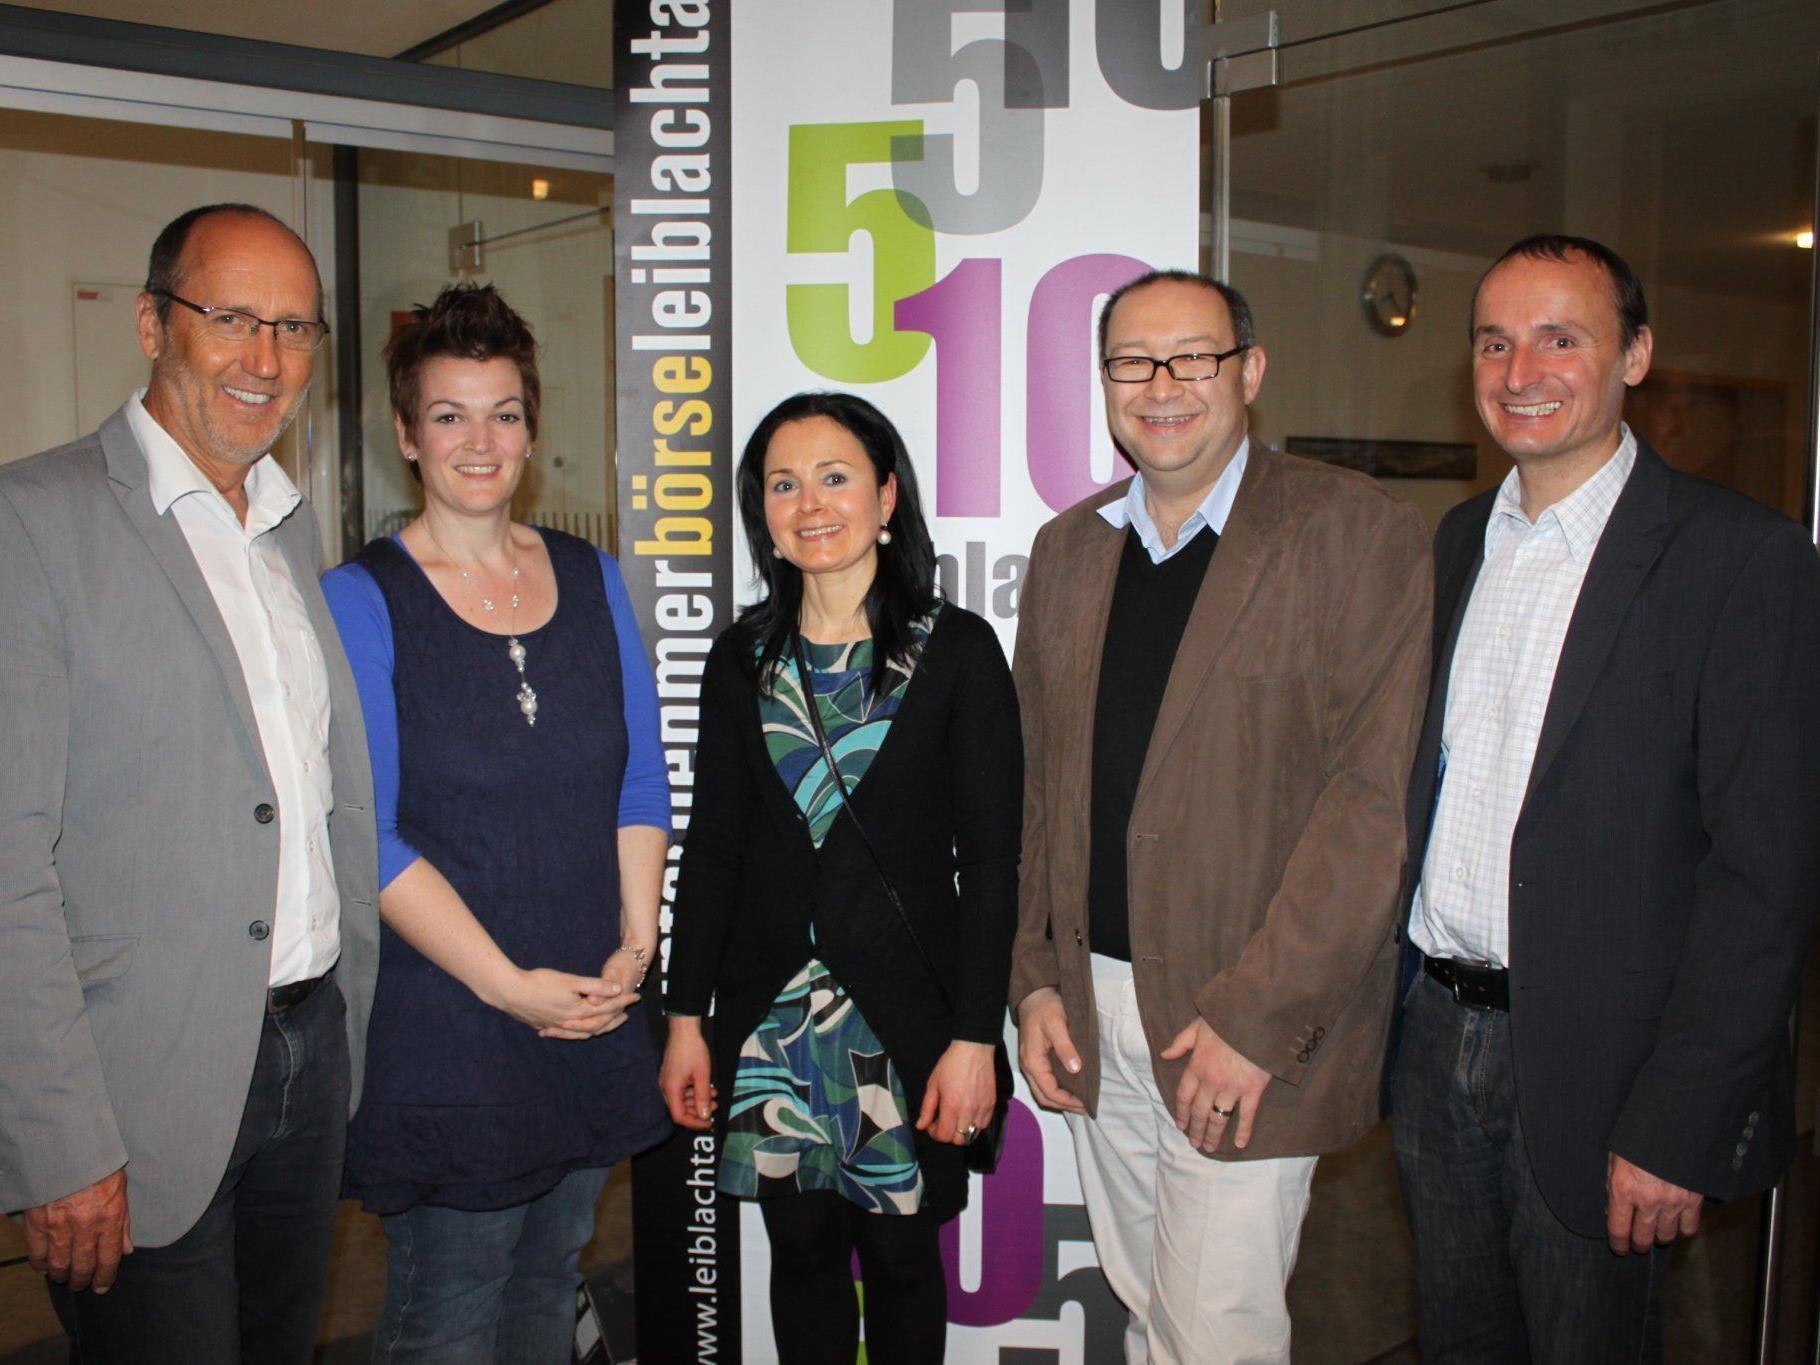 Xaver Sinz, Nadja Natter, Obfrau Unternehmerbörse Veronika Matt, Langes Wolfgang und Alfons Rädler.